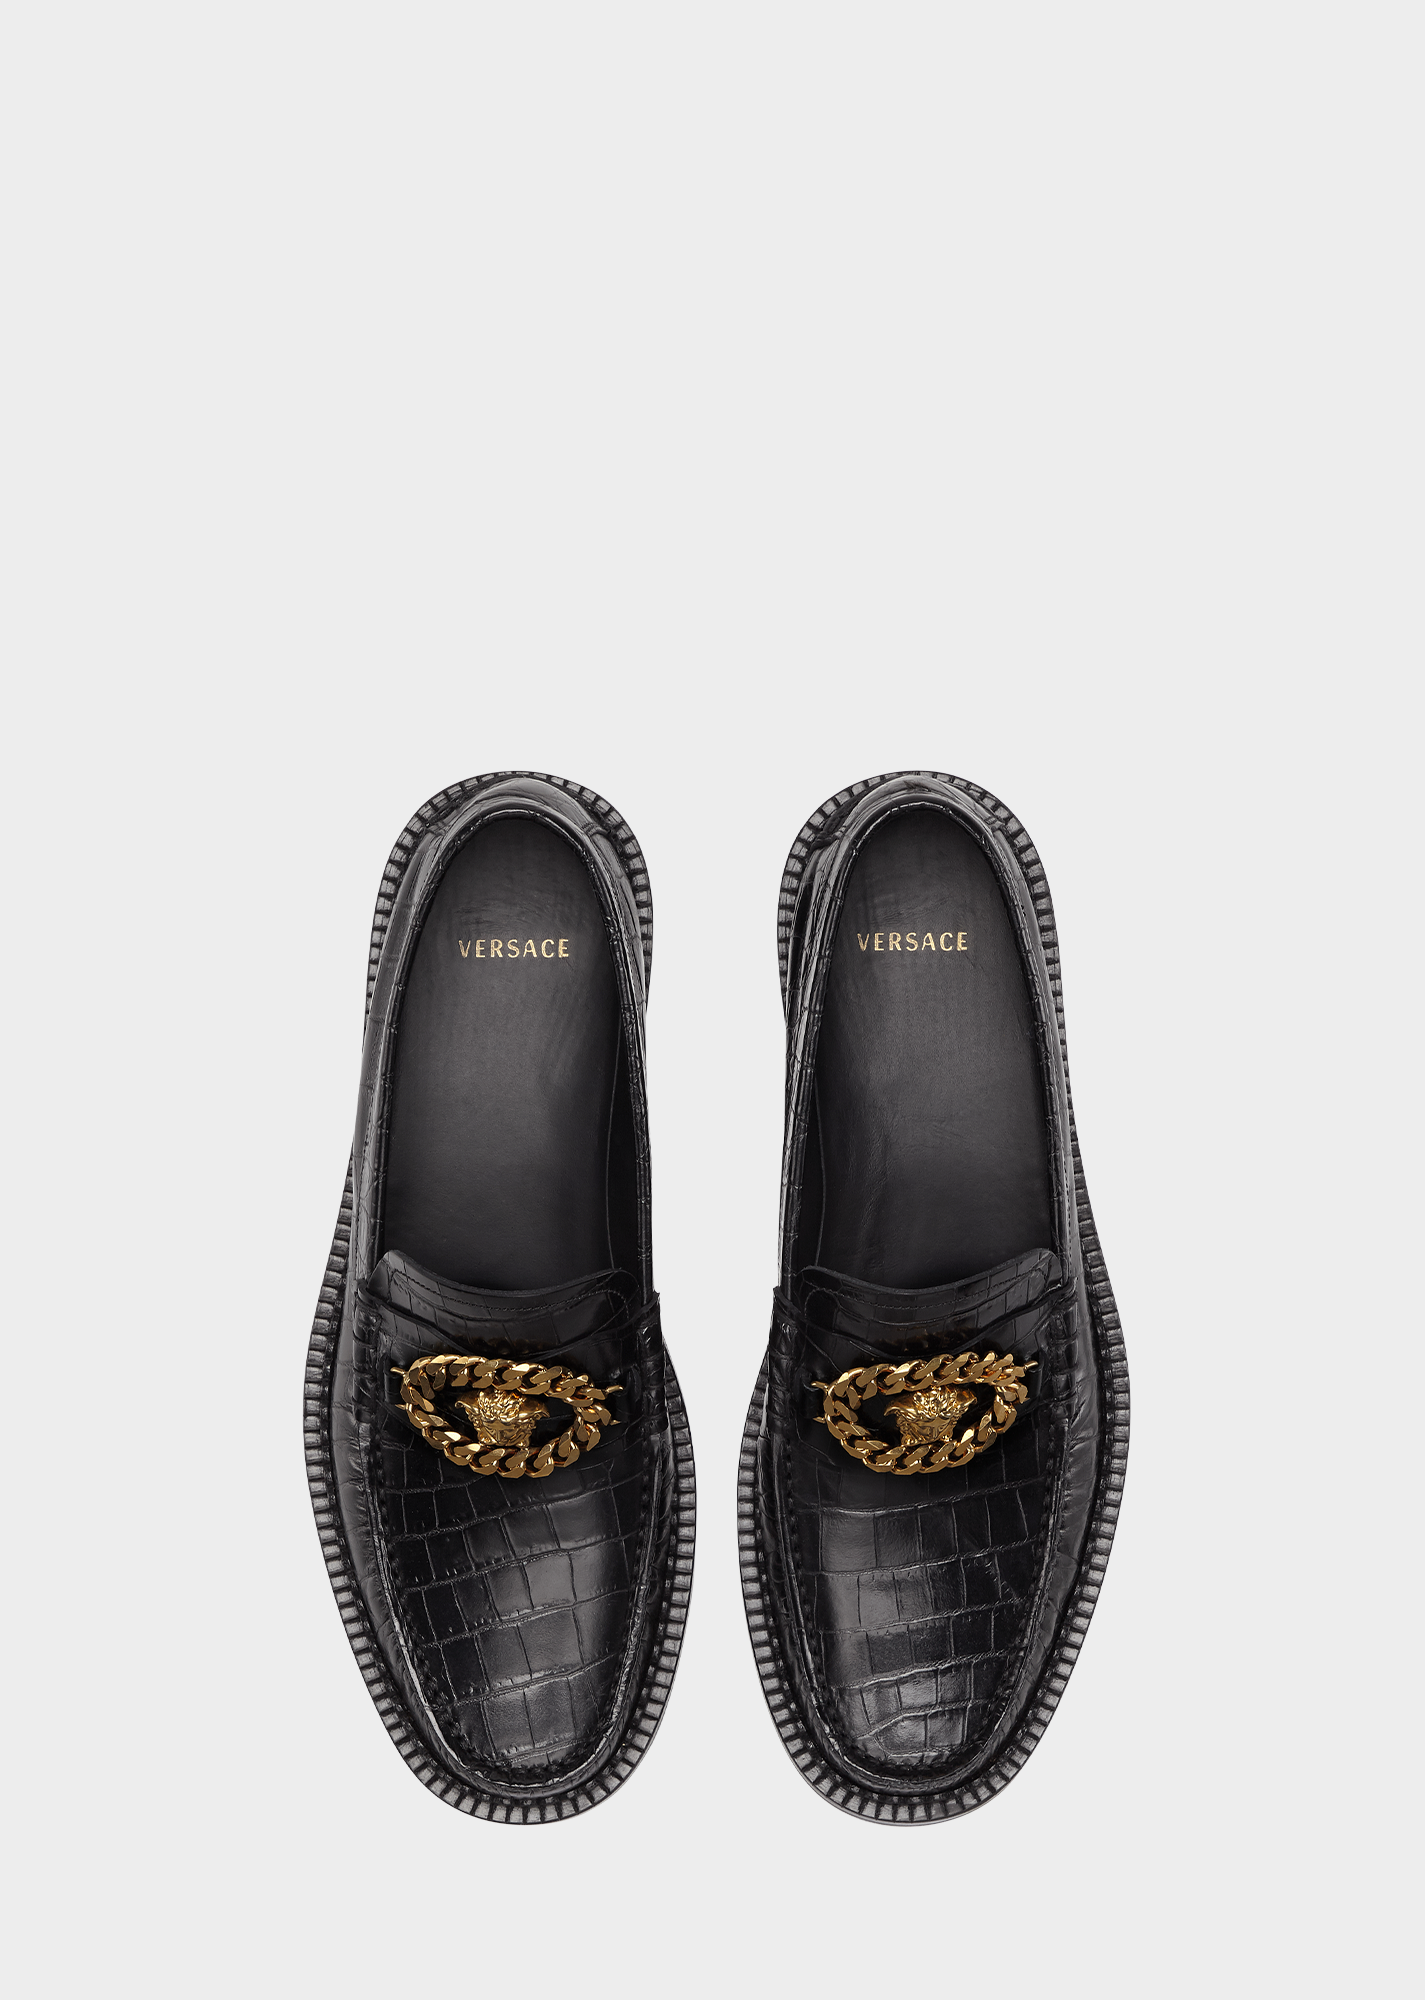 Mock Croc Medusa Chain Loafers for Men